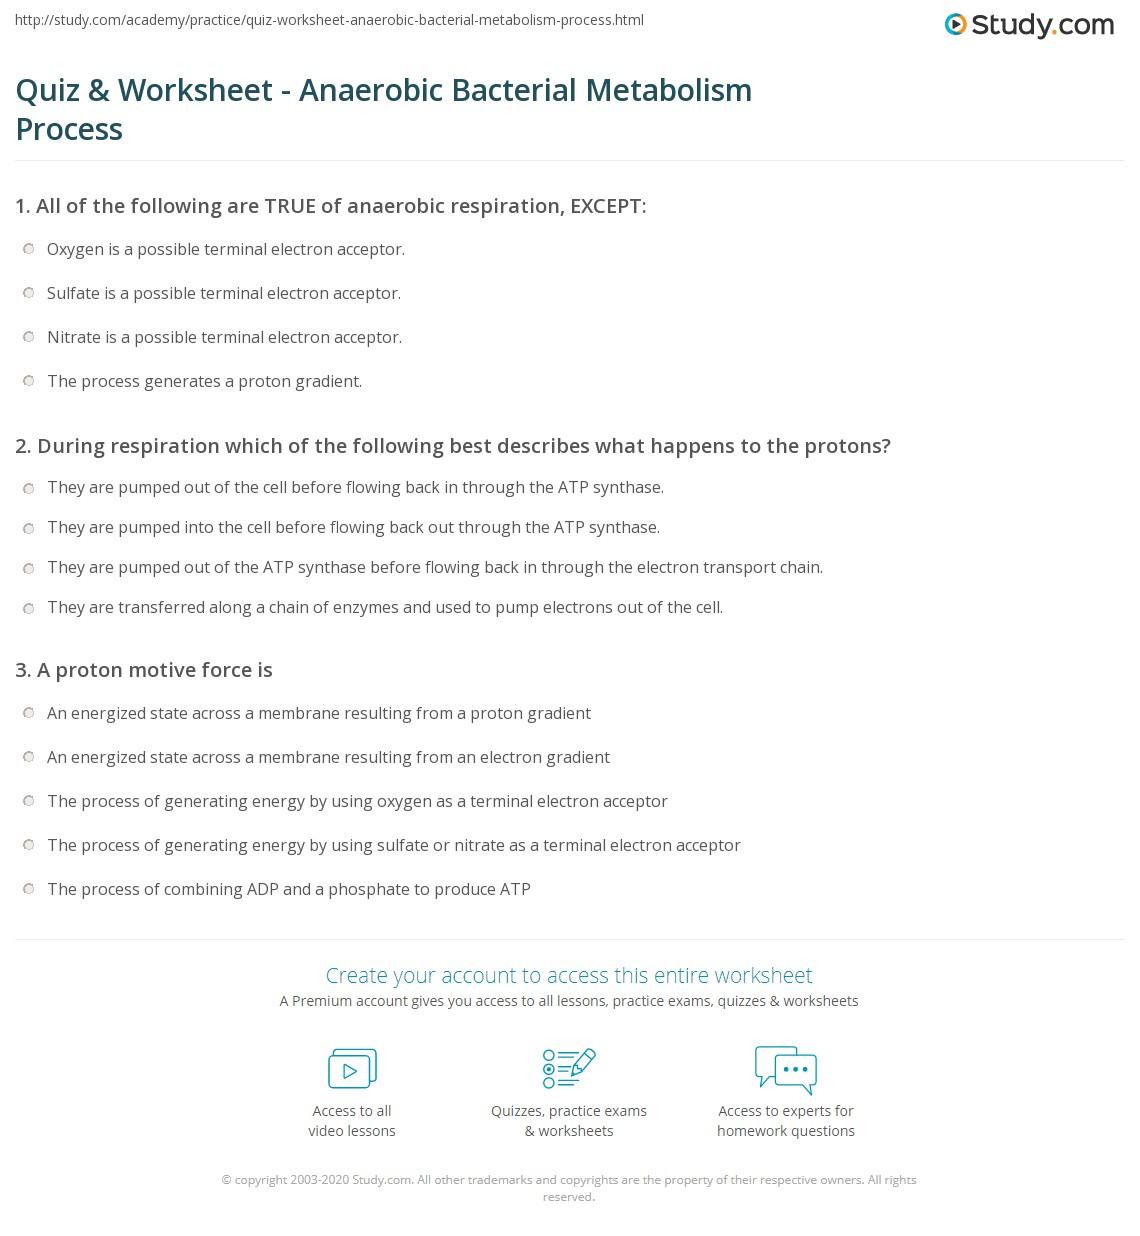 Quiz Worksheet Anaerobic Bacterial Metabolism Process – Aerobic Respiration Worksheet